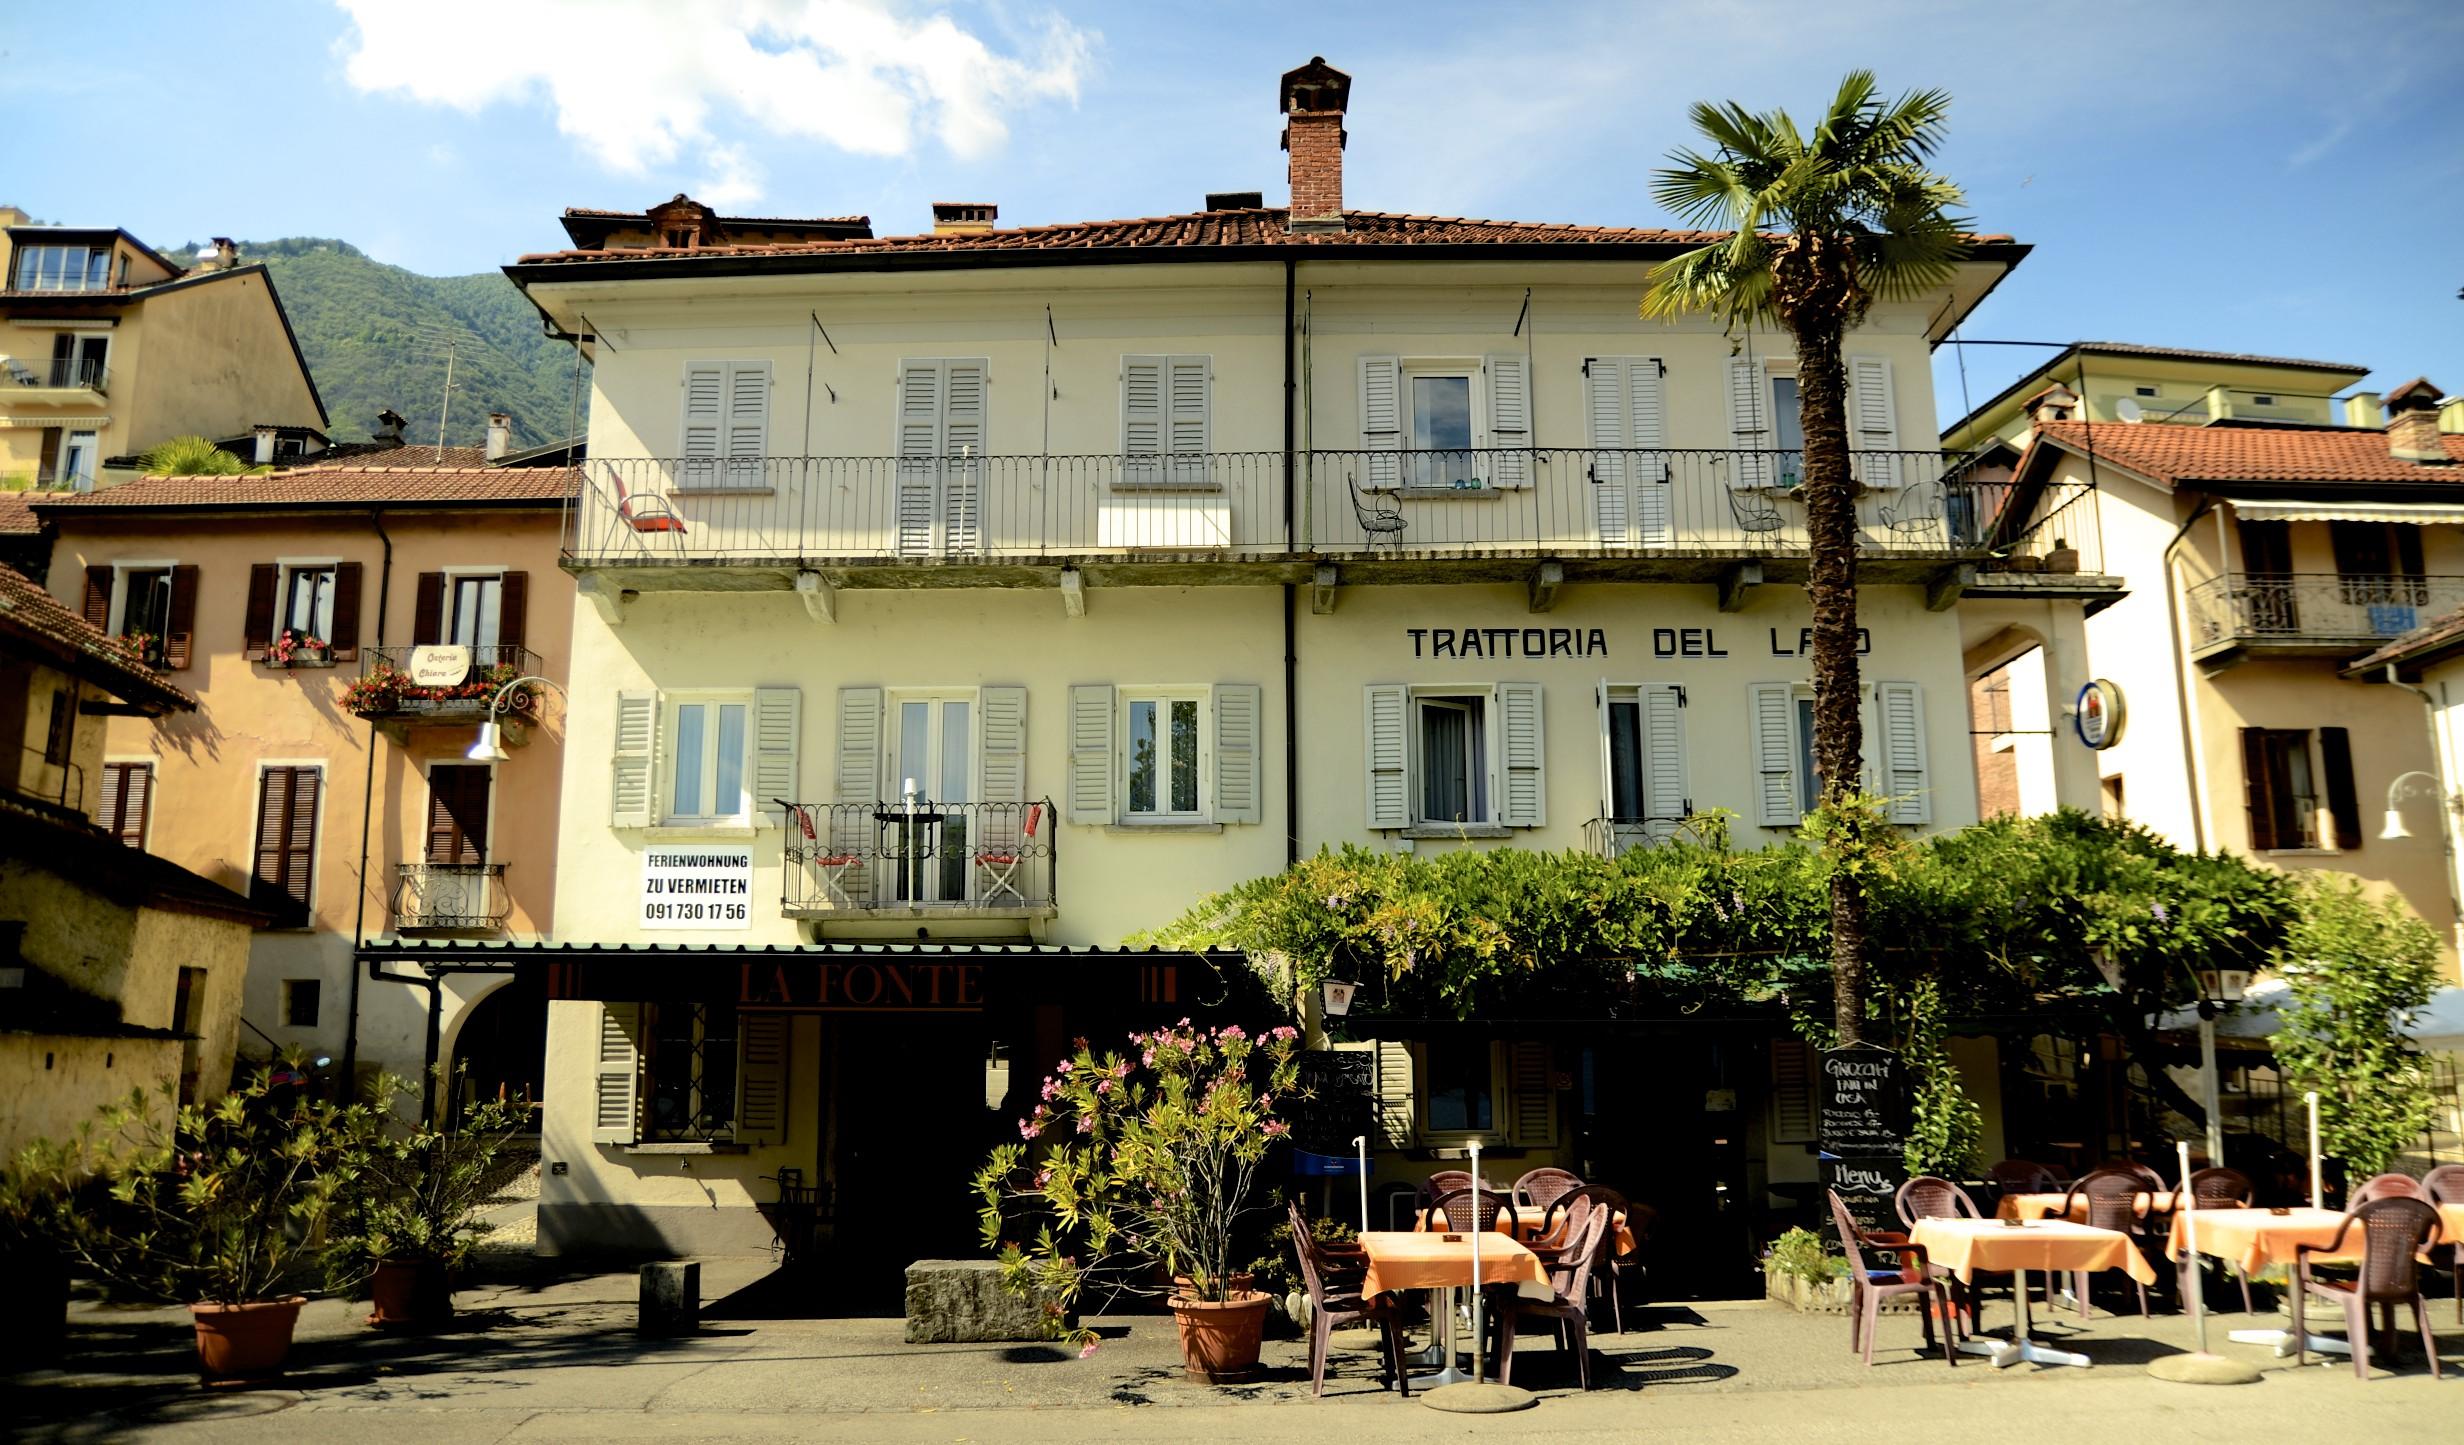 Bella vita dans le Tessin - suisse, europe, a-faire